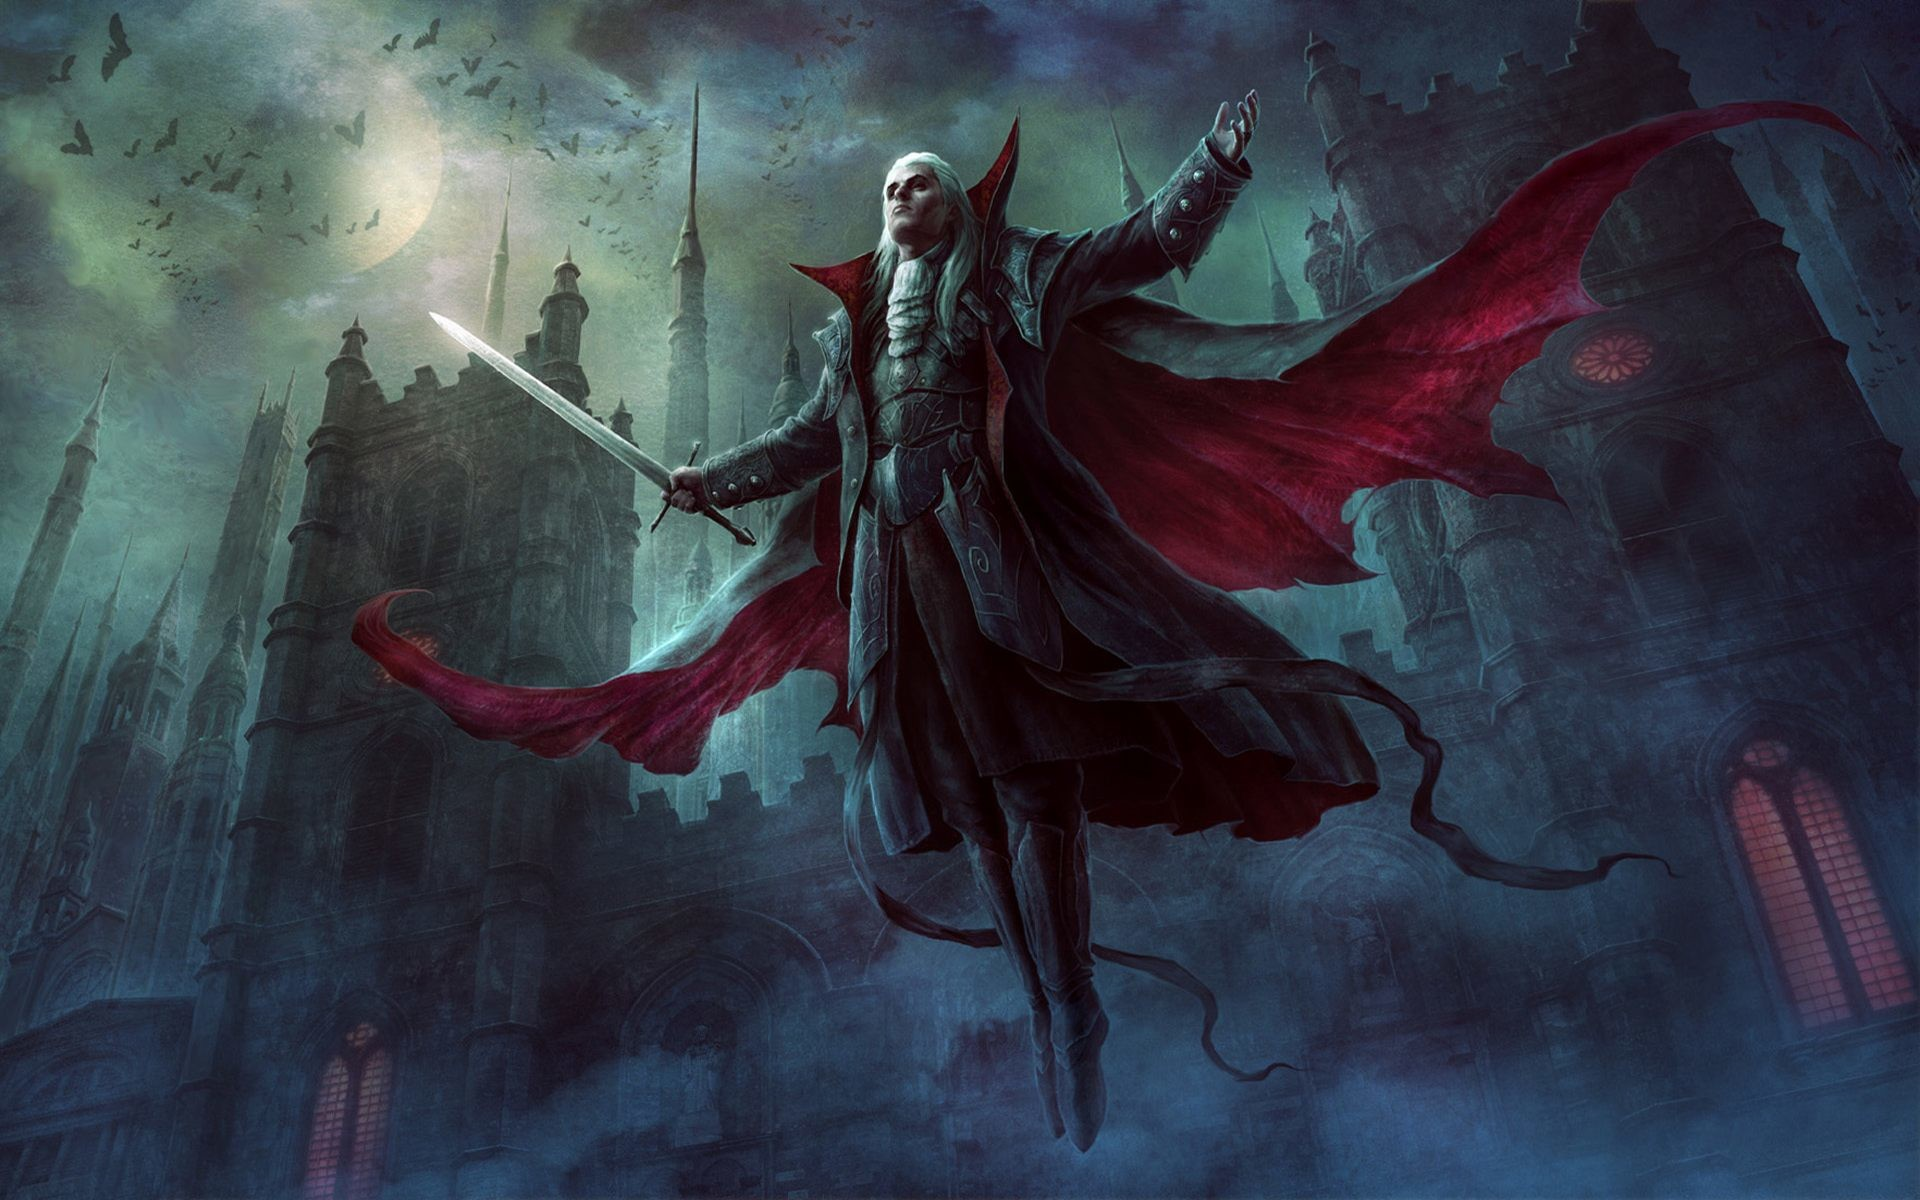 Fantasy Art Vampires Wallpapers Hd Desktop And Mobile: Fantasy Vampire Wallpaper ·① WallpaperTag